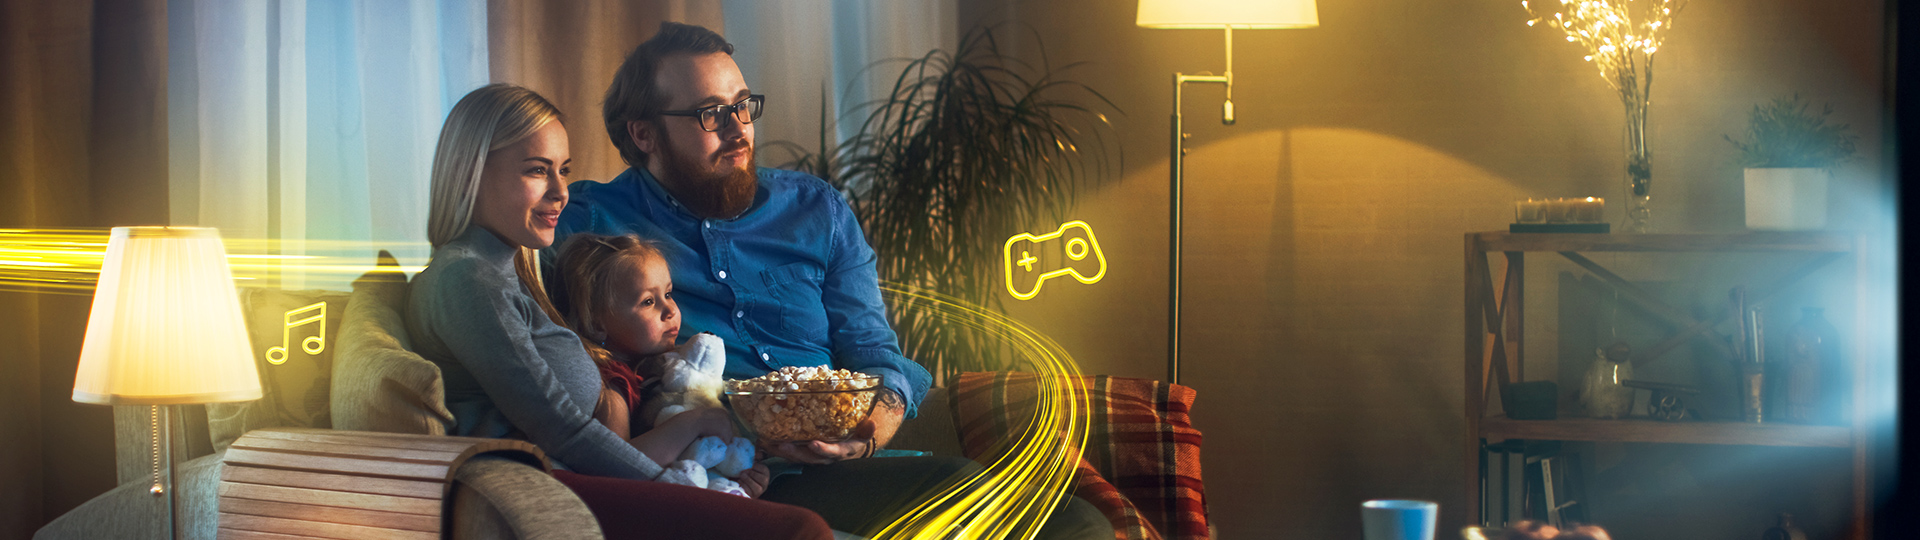 Redel Internet Fibra Óptica - Balneário Camboriú, Itajaí e região